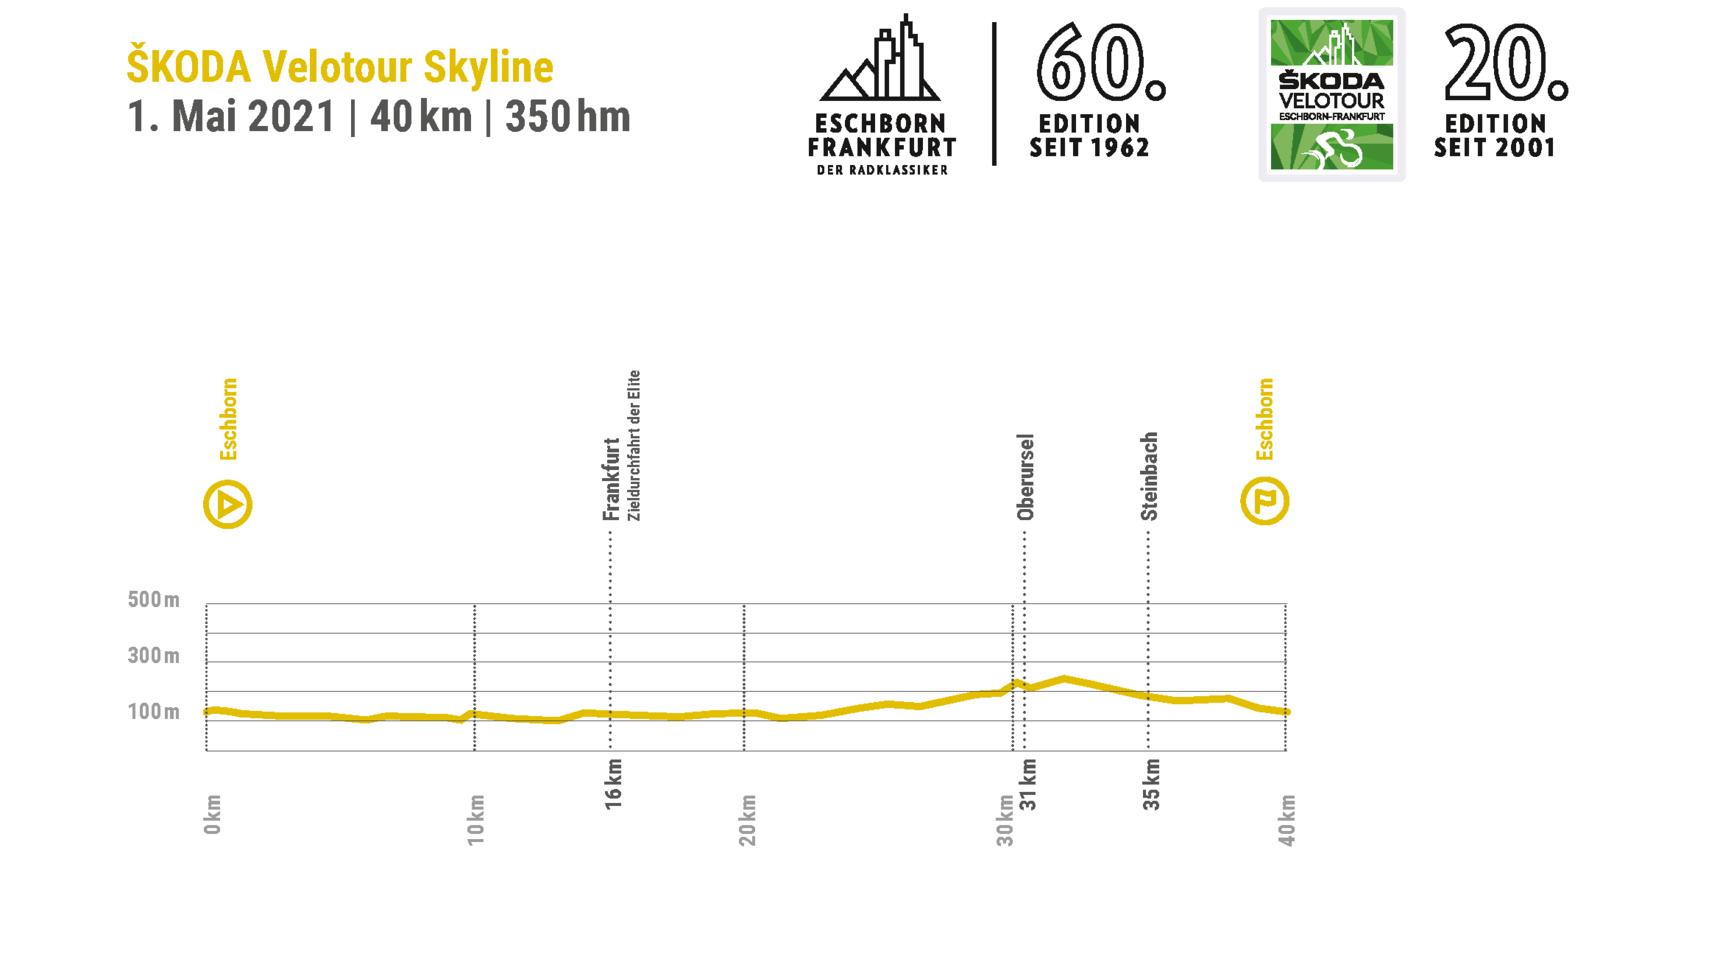 Höhenprofil ŠKODA Velotour Skyline & Ride